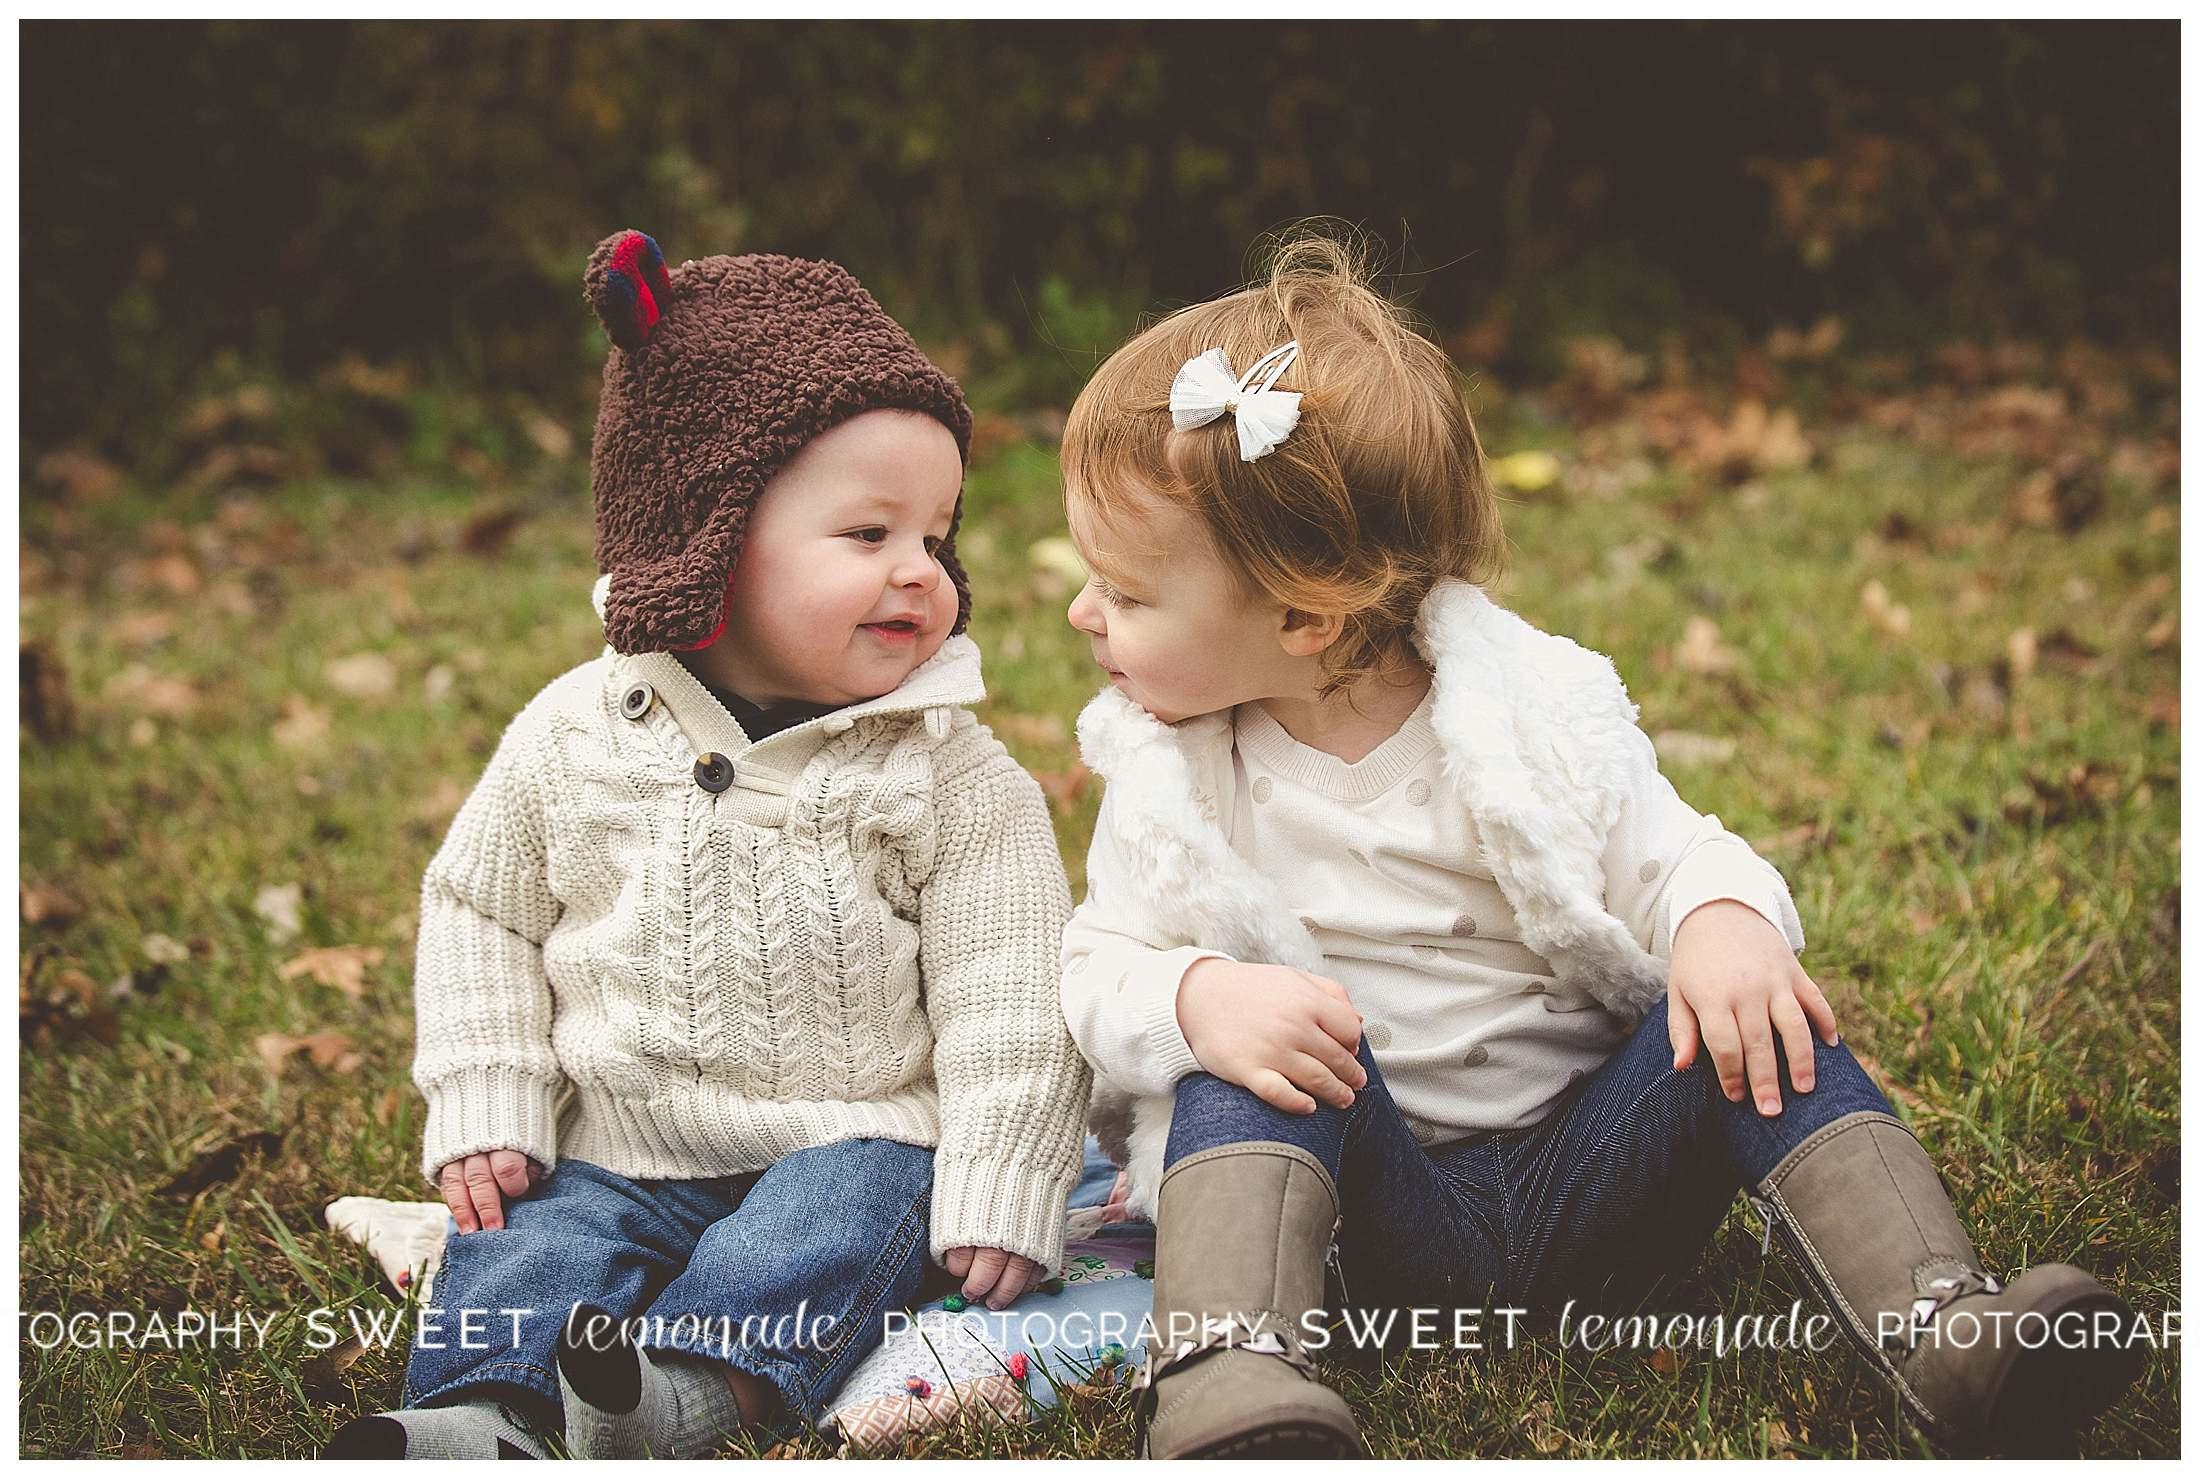 champaign-county-mahomet-illinois-family-photographer-sweet-lemonade-photography_1734.jpg